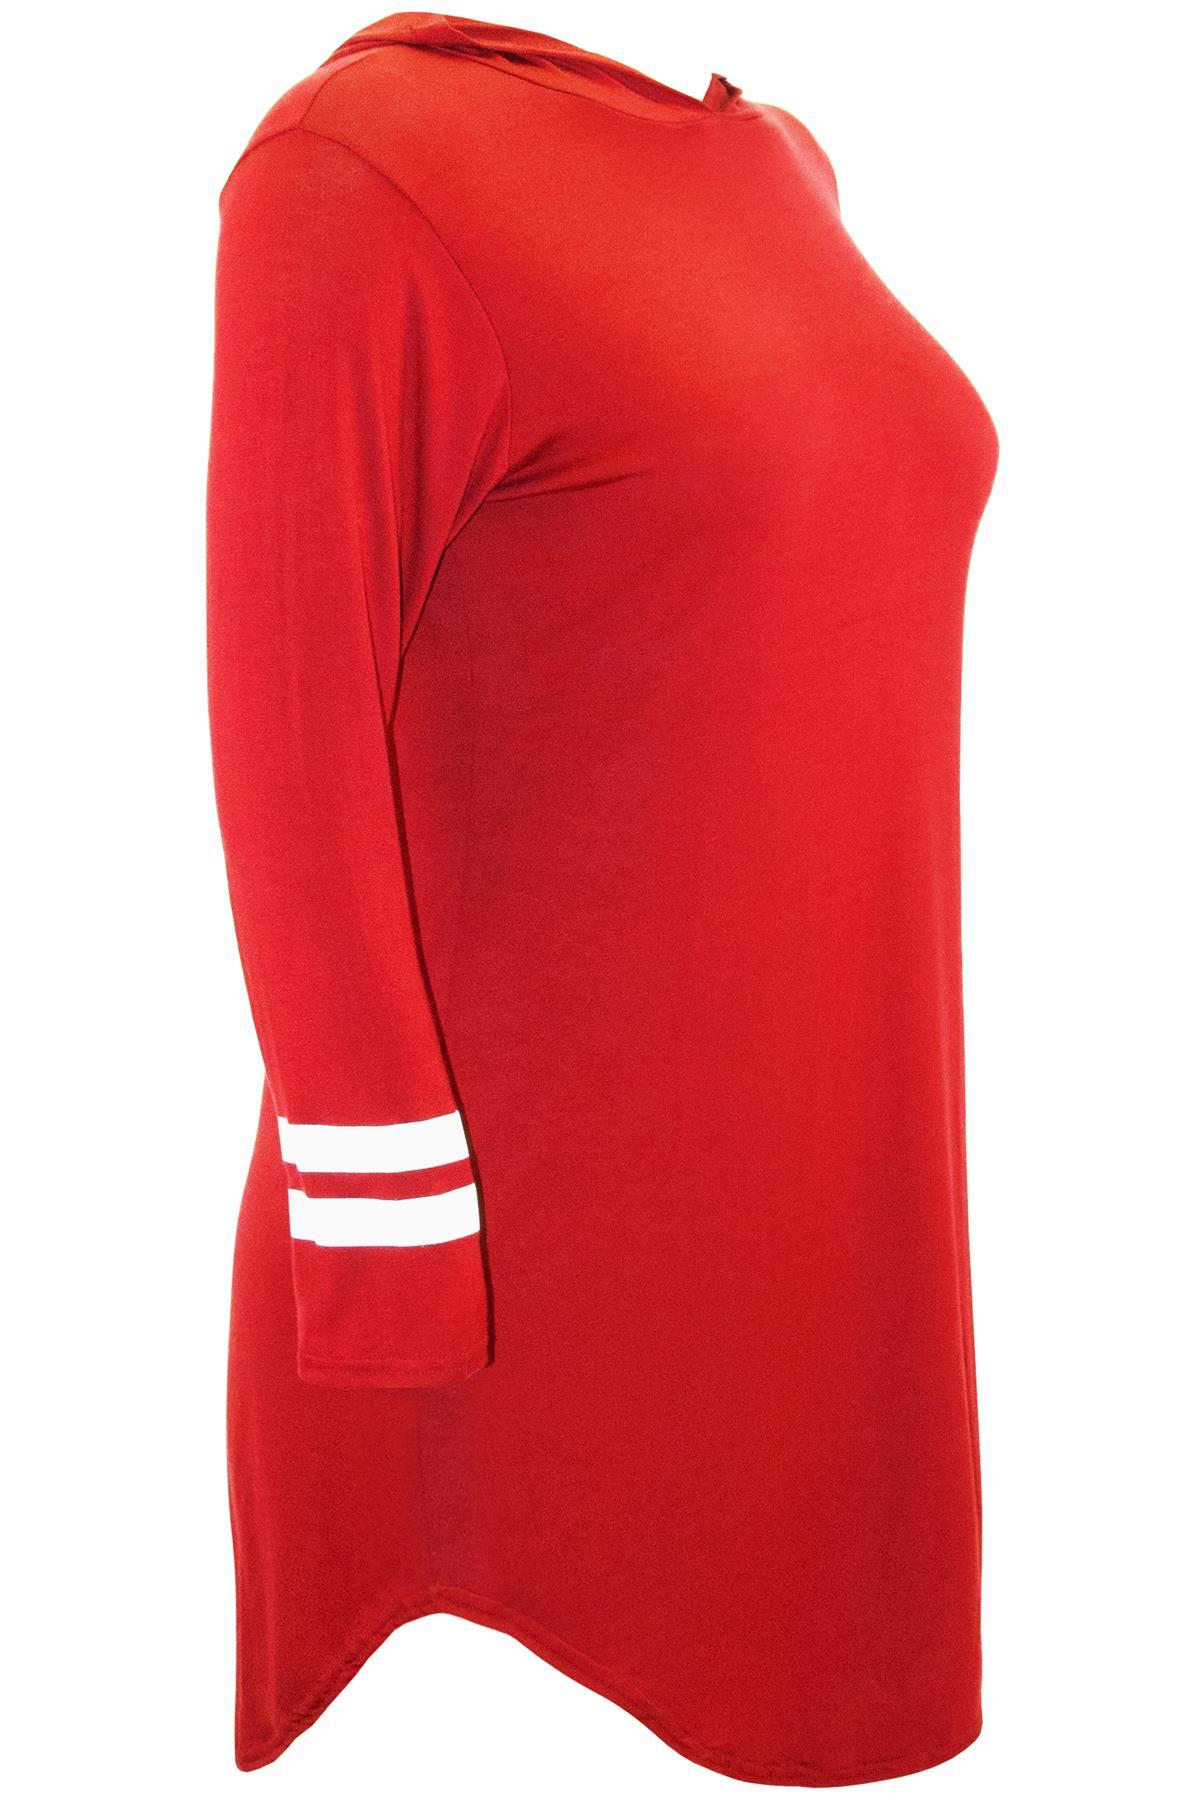 228ae3eddb Plus Size Ladies Womens Baggy Oversize Varsity Long Sleeve Stripes T ...